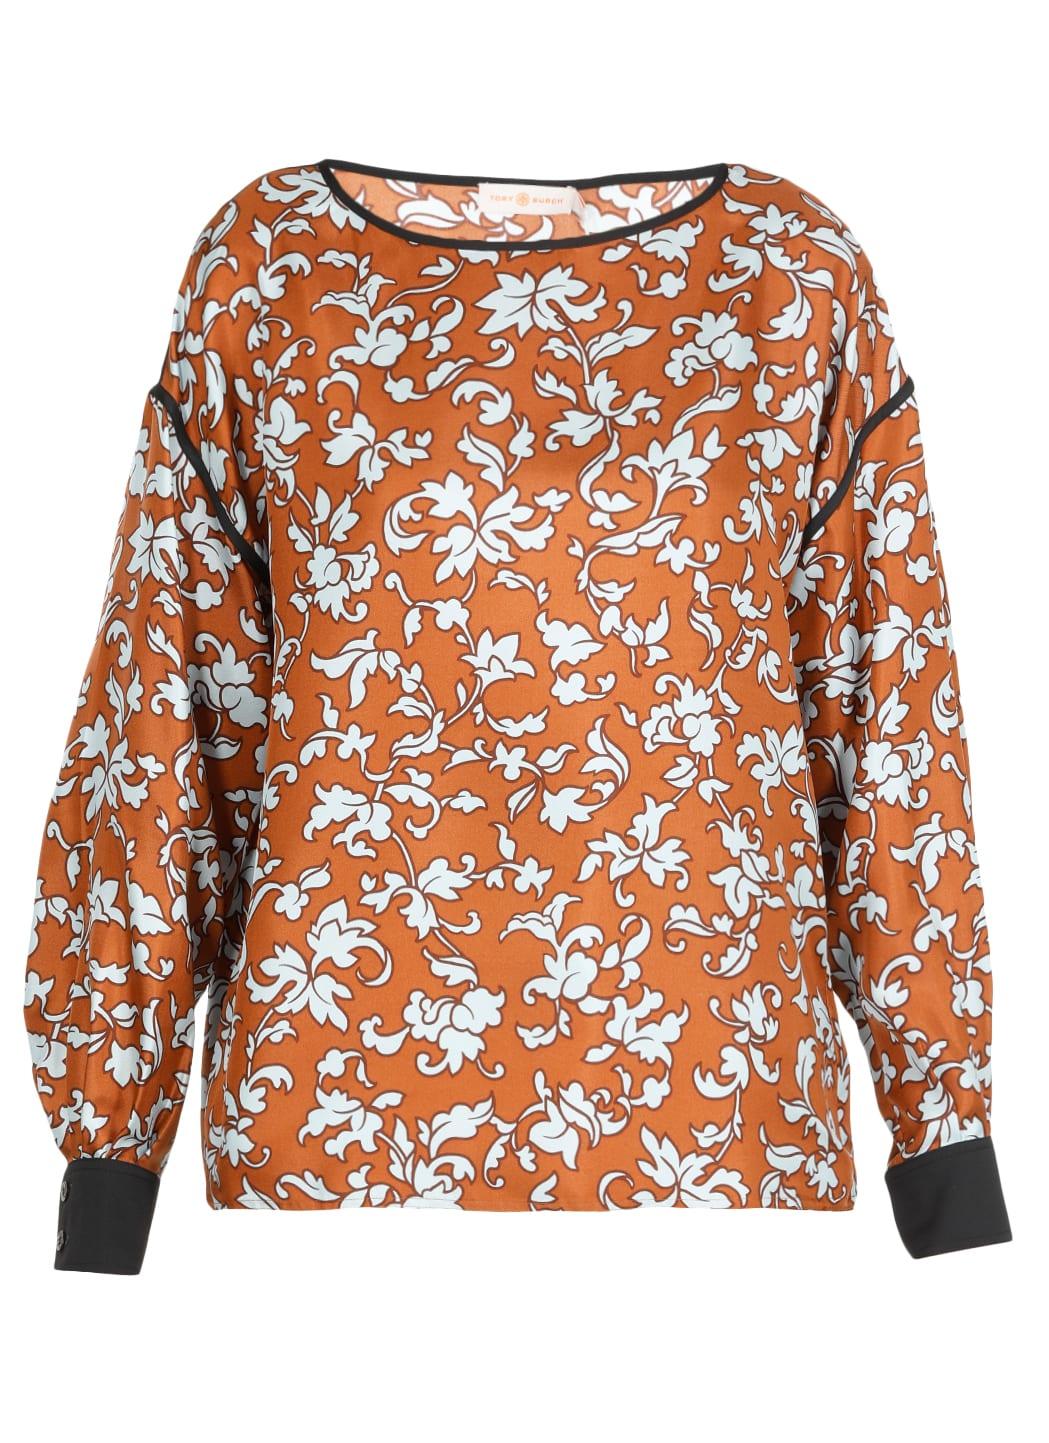 Tory Burch Floral Print Silk Blouse